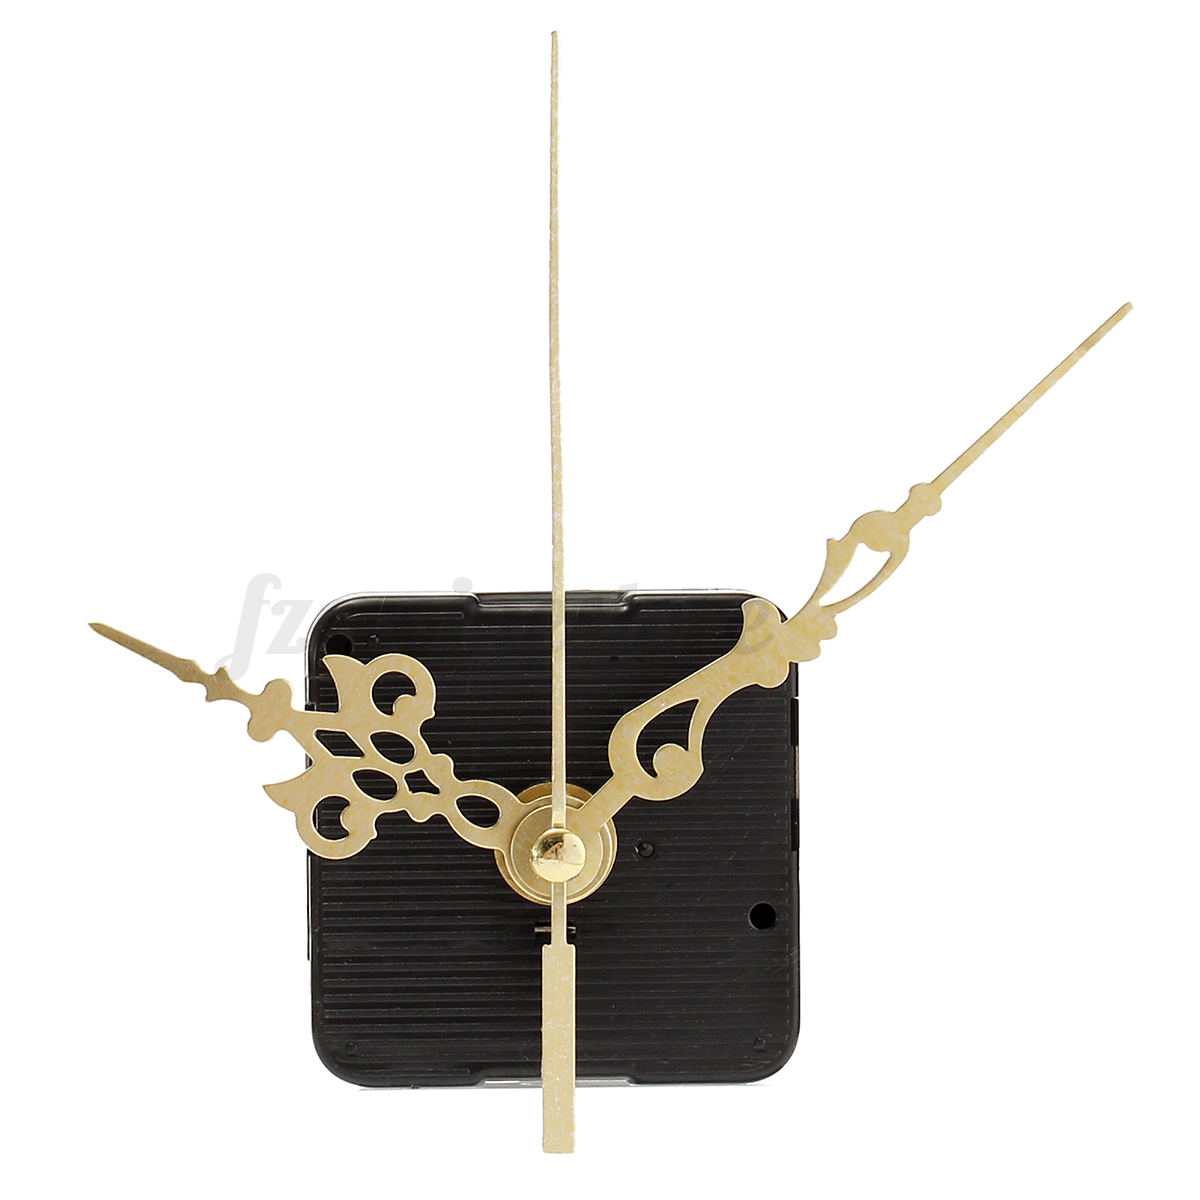 silent quartz clock movement mechanism hands wall repair